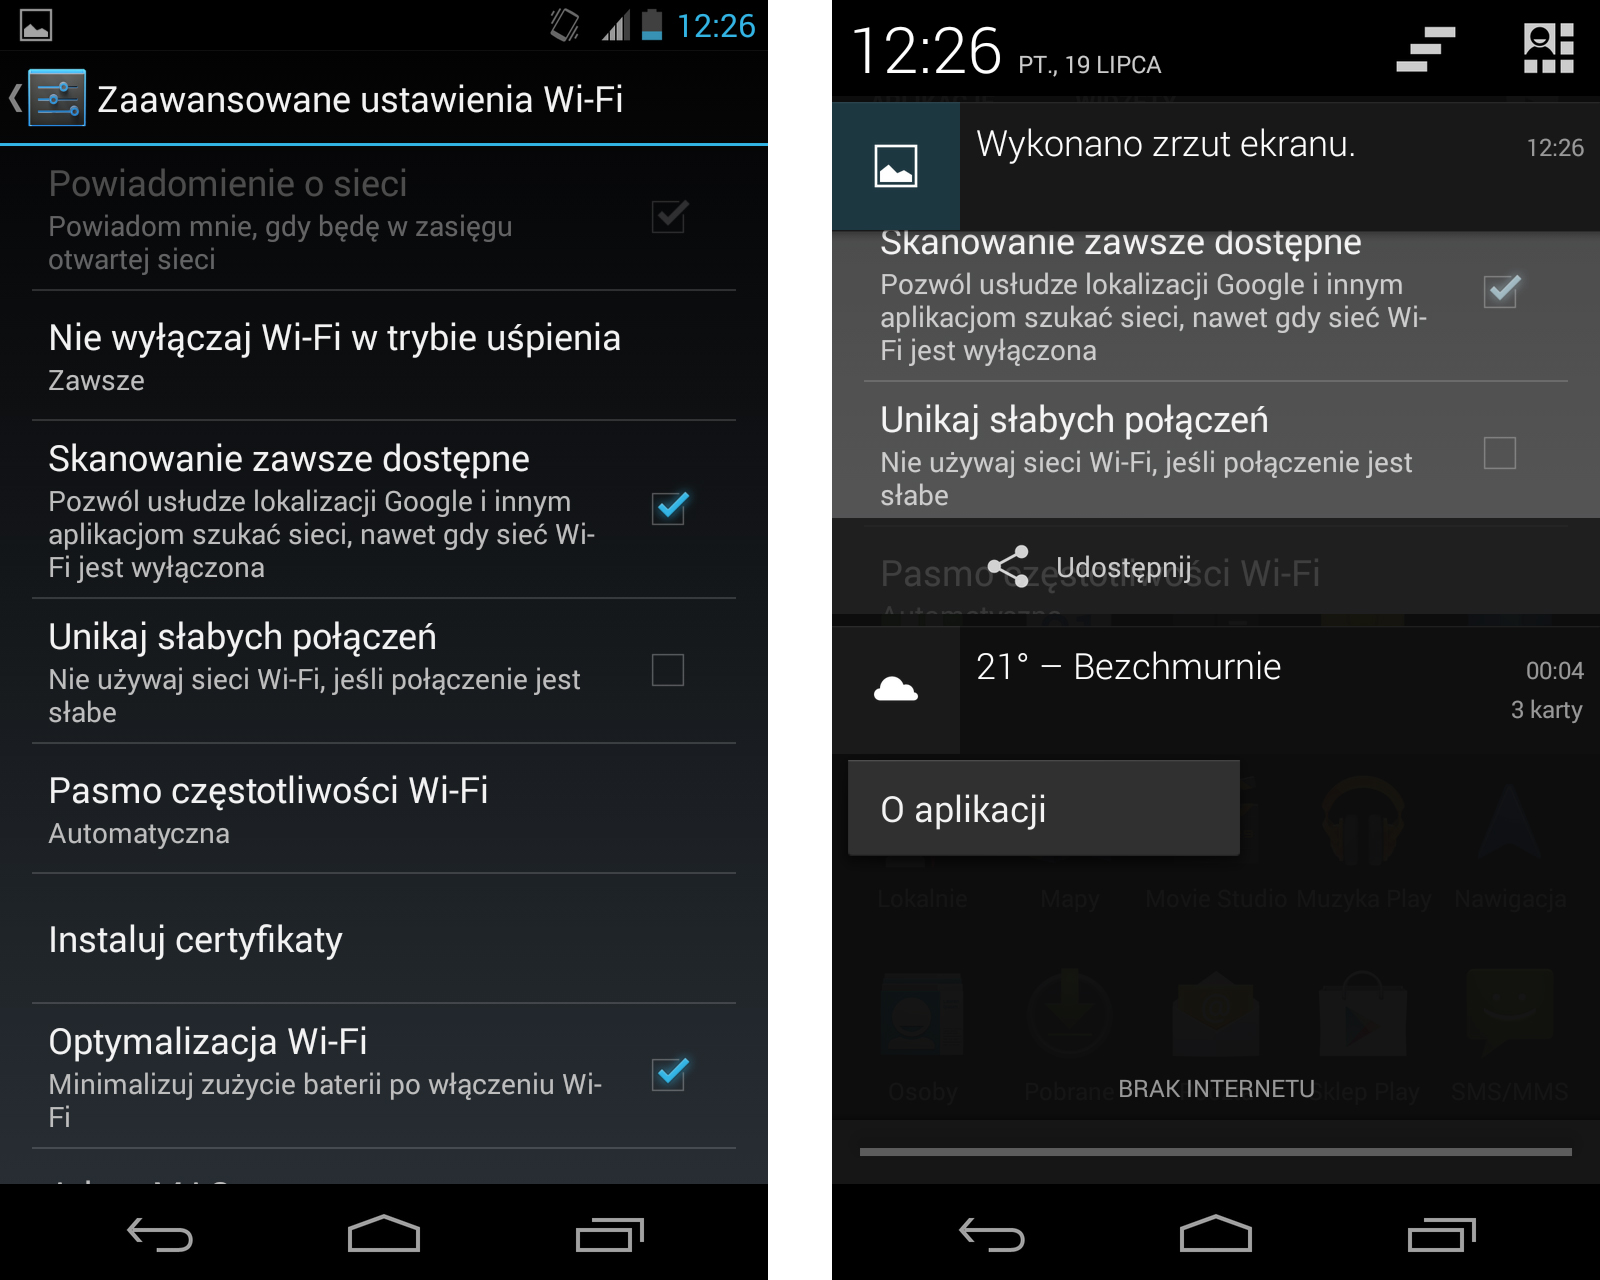 Screenshot_2013-07-19-12-26-15